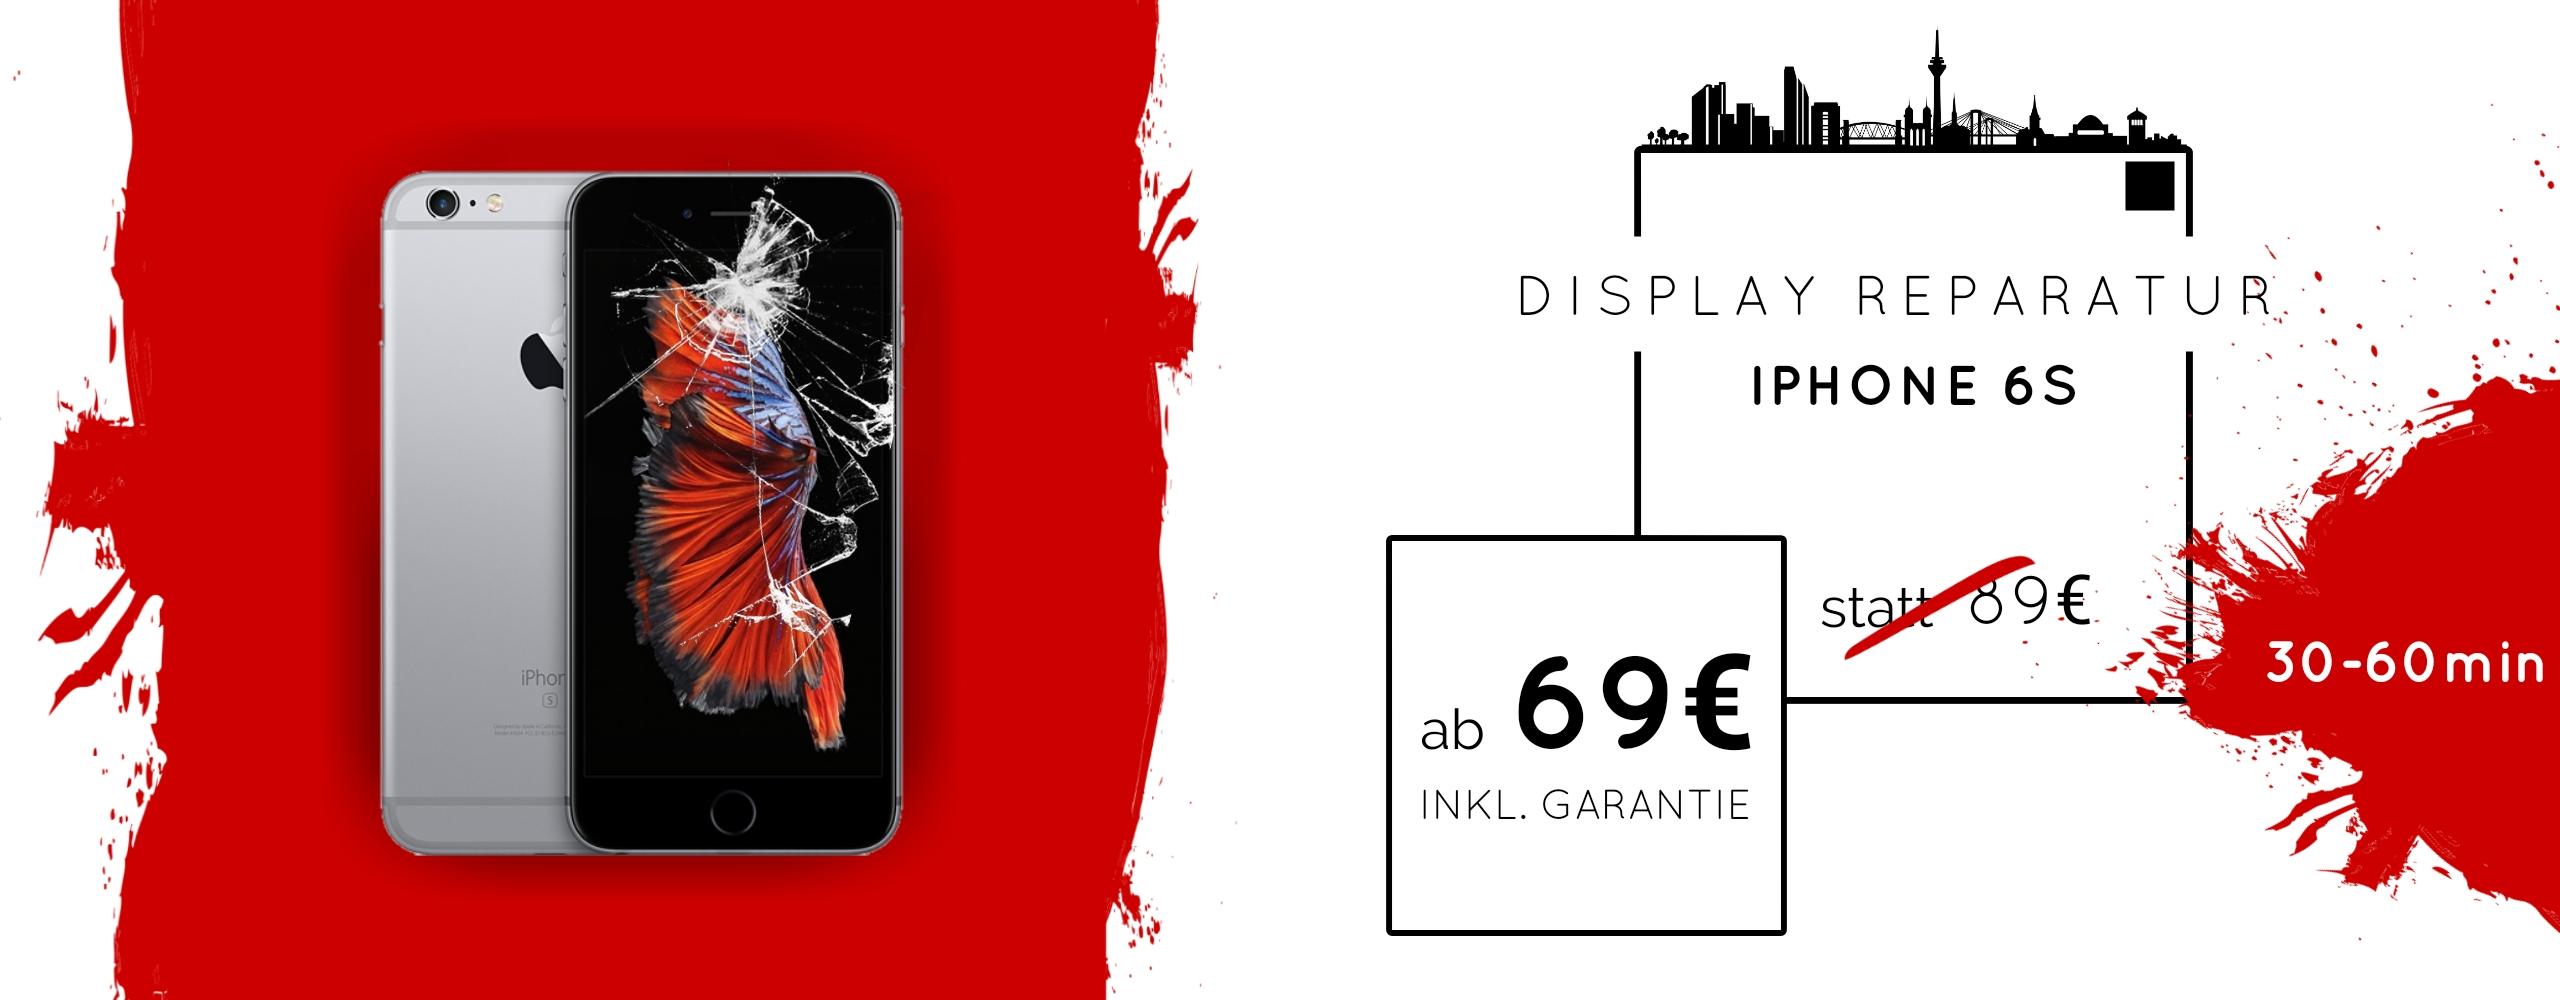 Smartphone Apple iPhone 6s Display Gals Reparatur Austausch